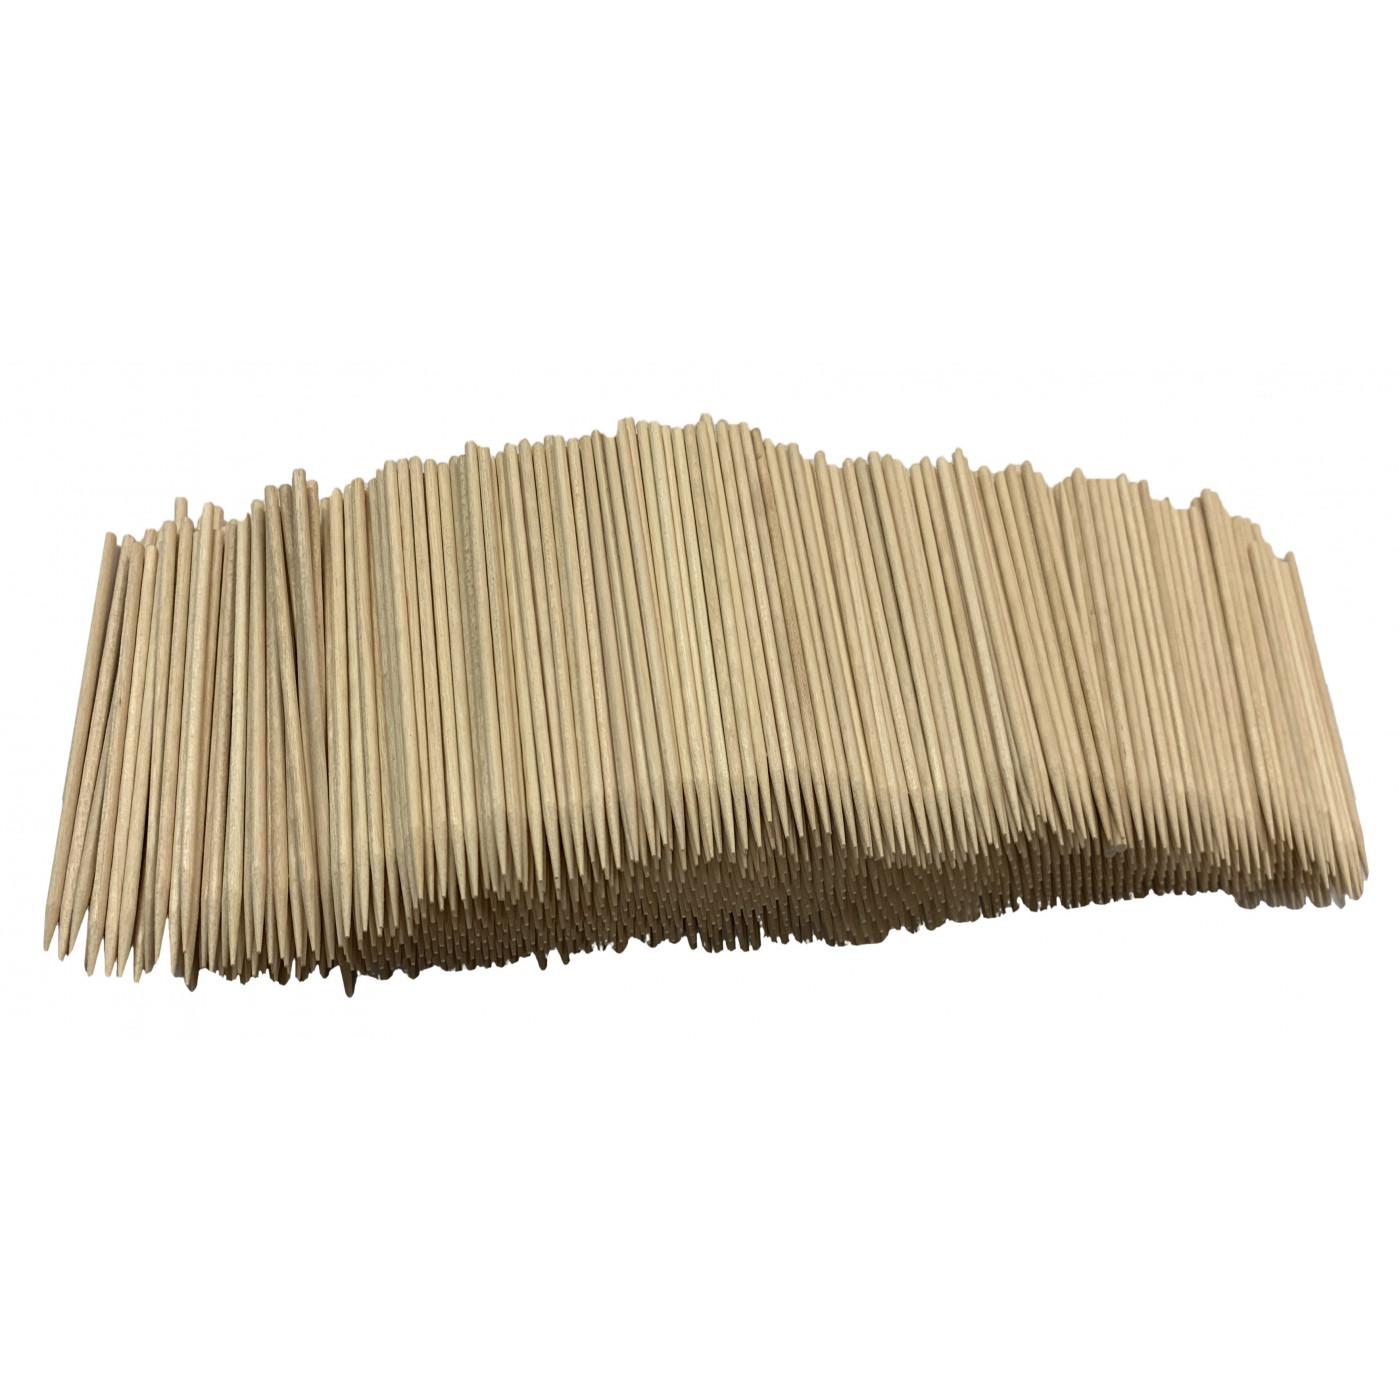 Set of 1500 wooden sticks (2.5 mm x 11 cm)  - 1